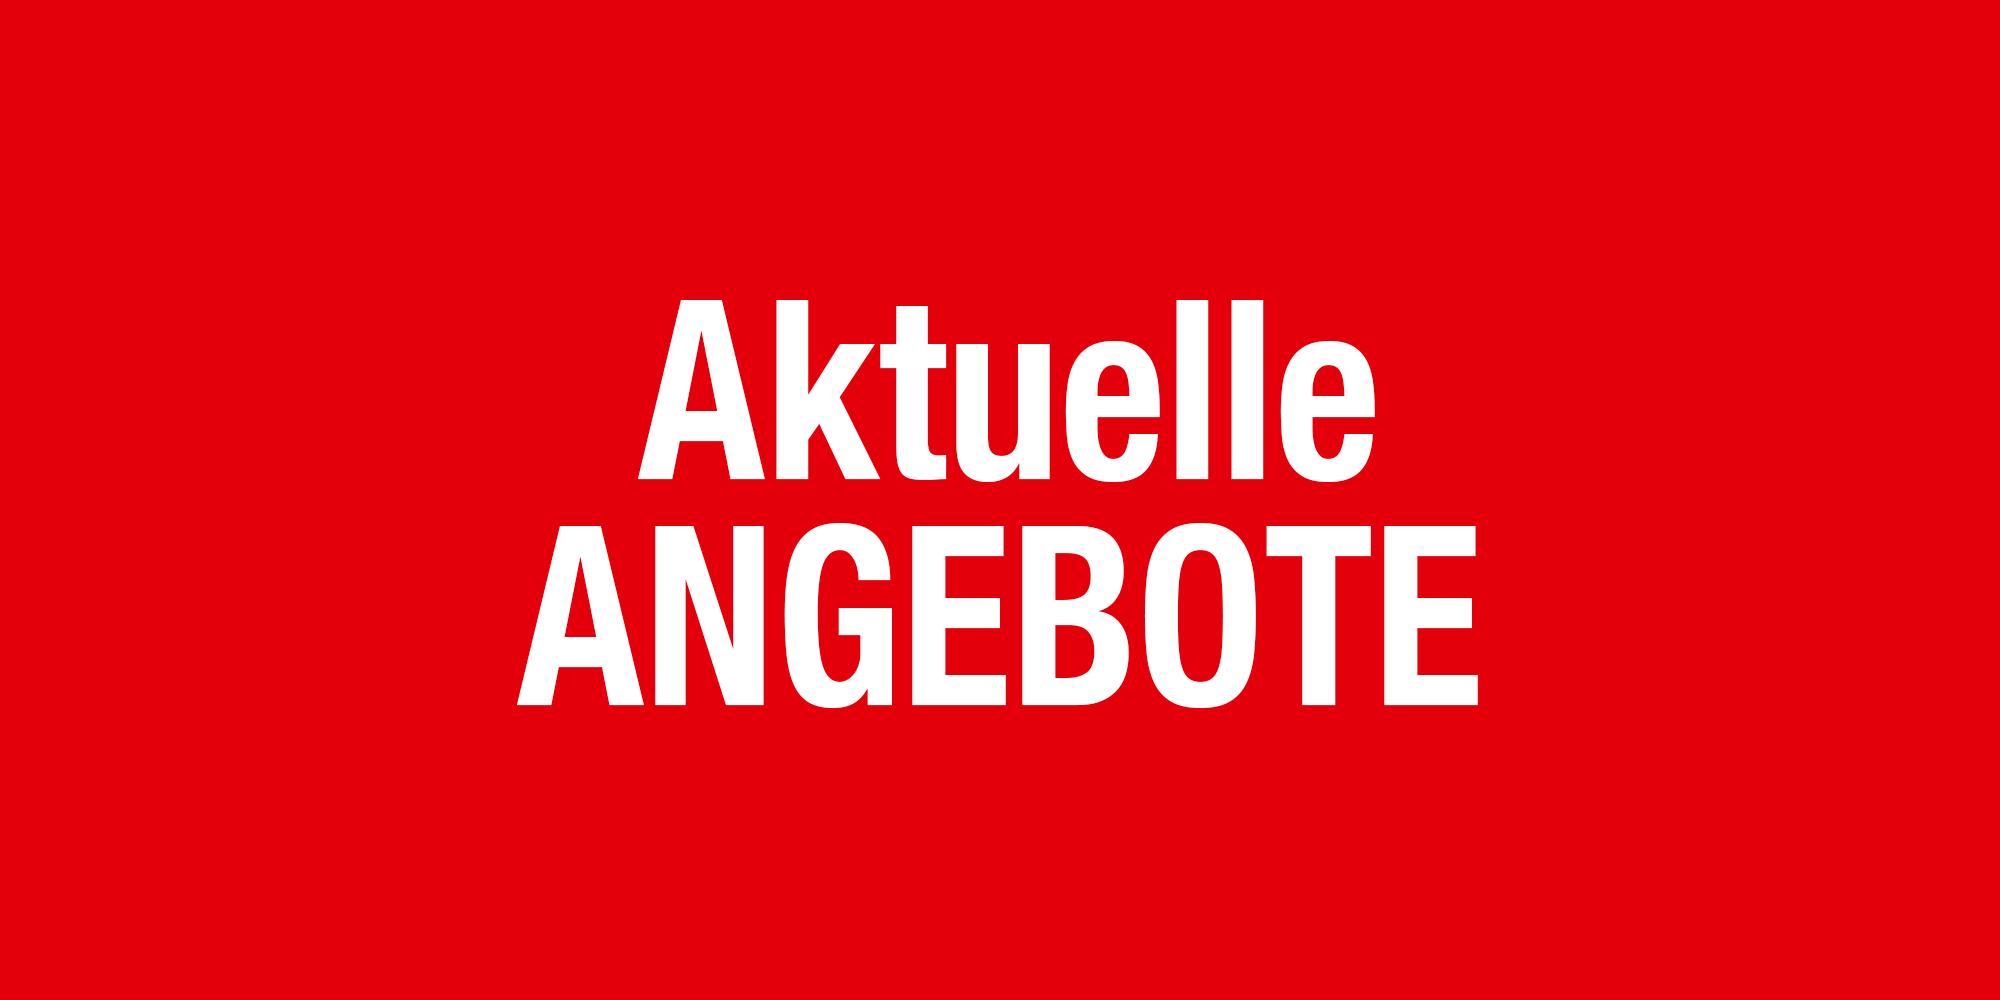 Büro Box Buxtehuder Büroartikel Markt: Aktuelle Angebote